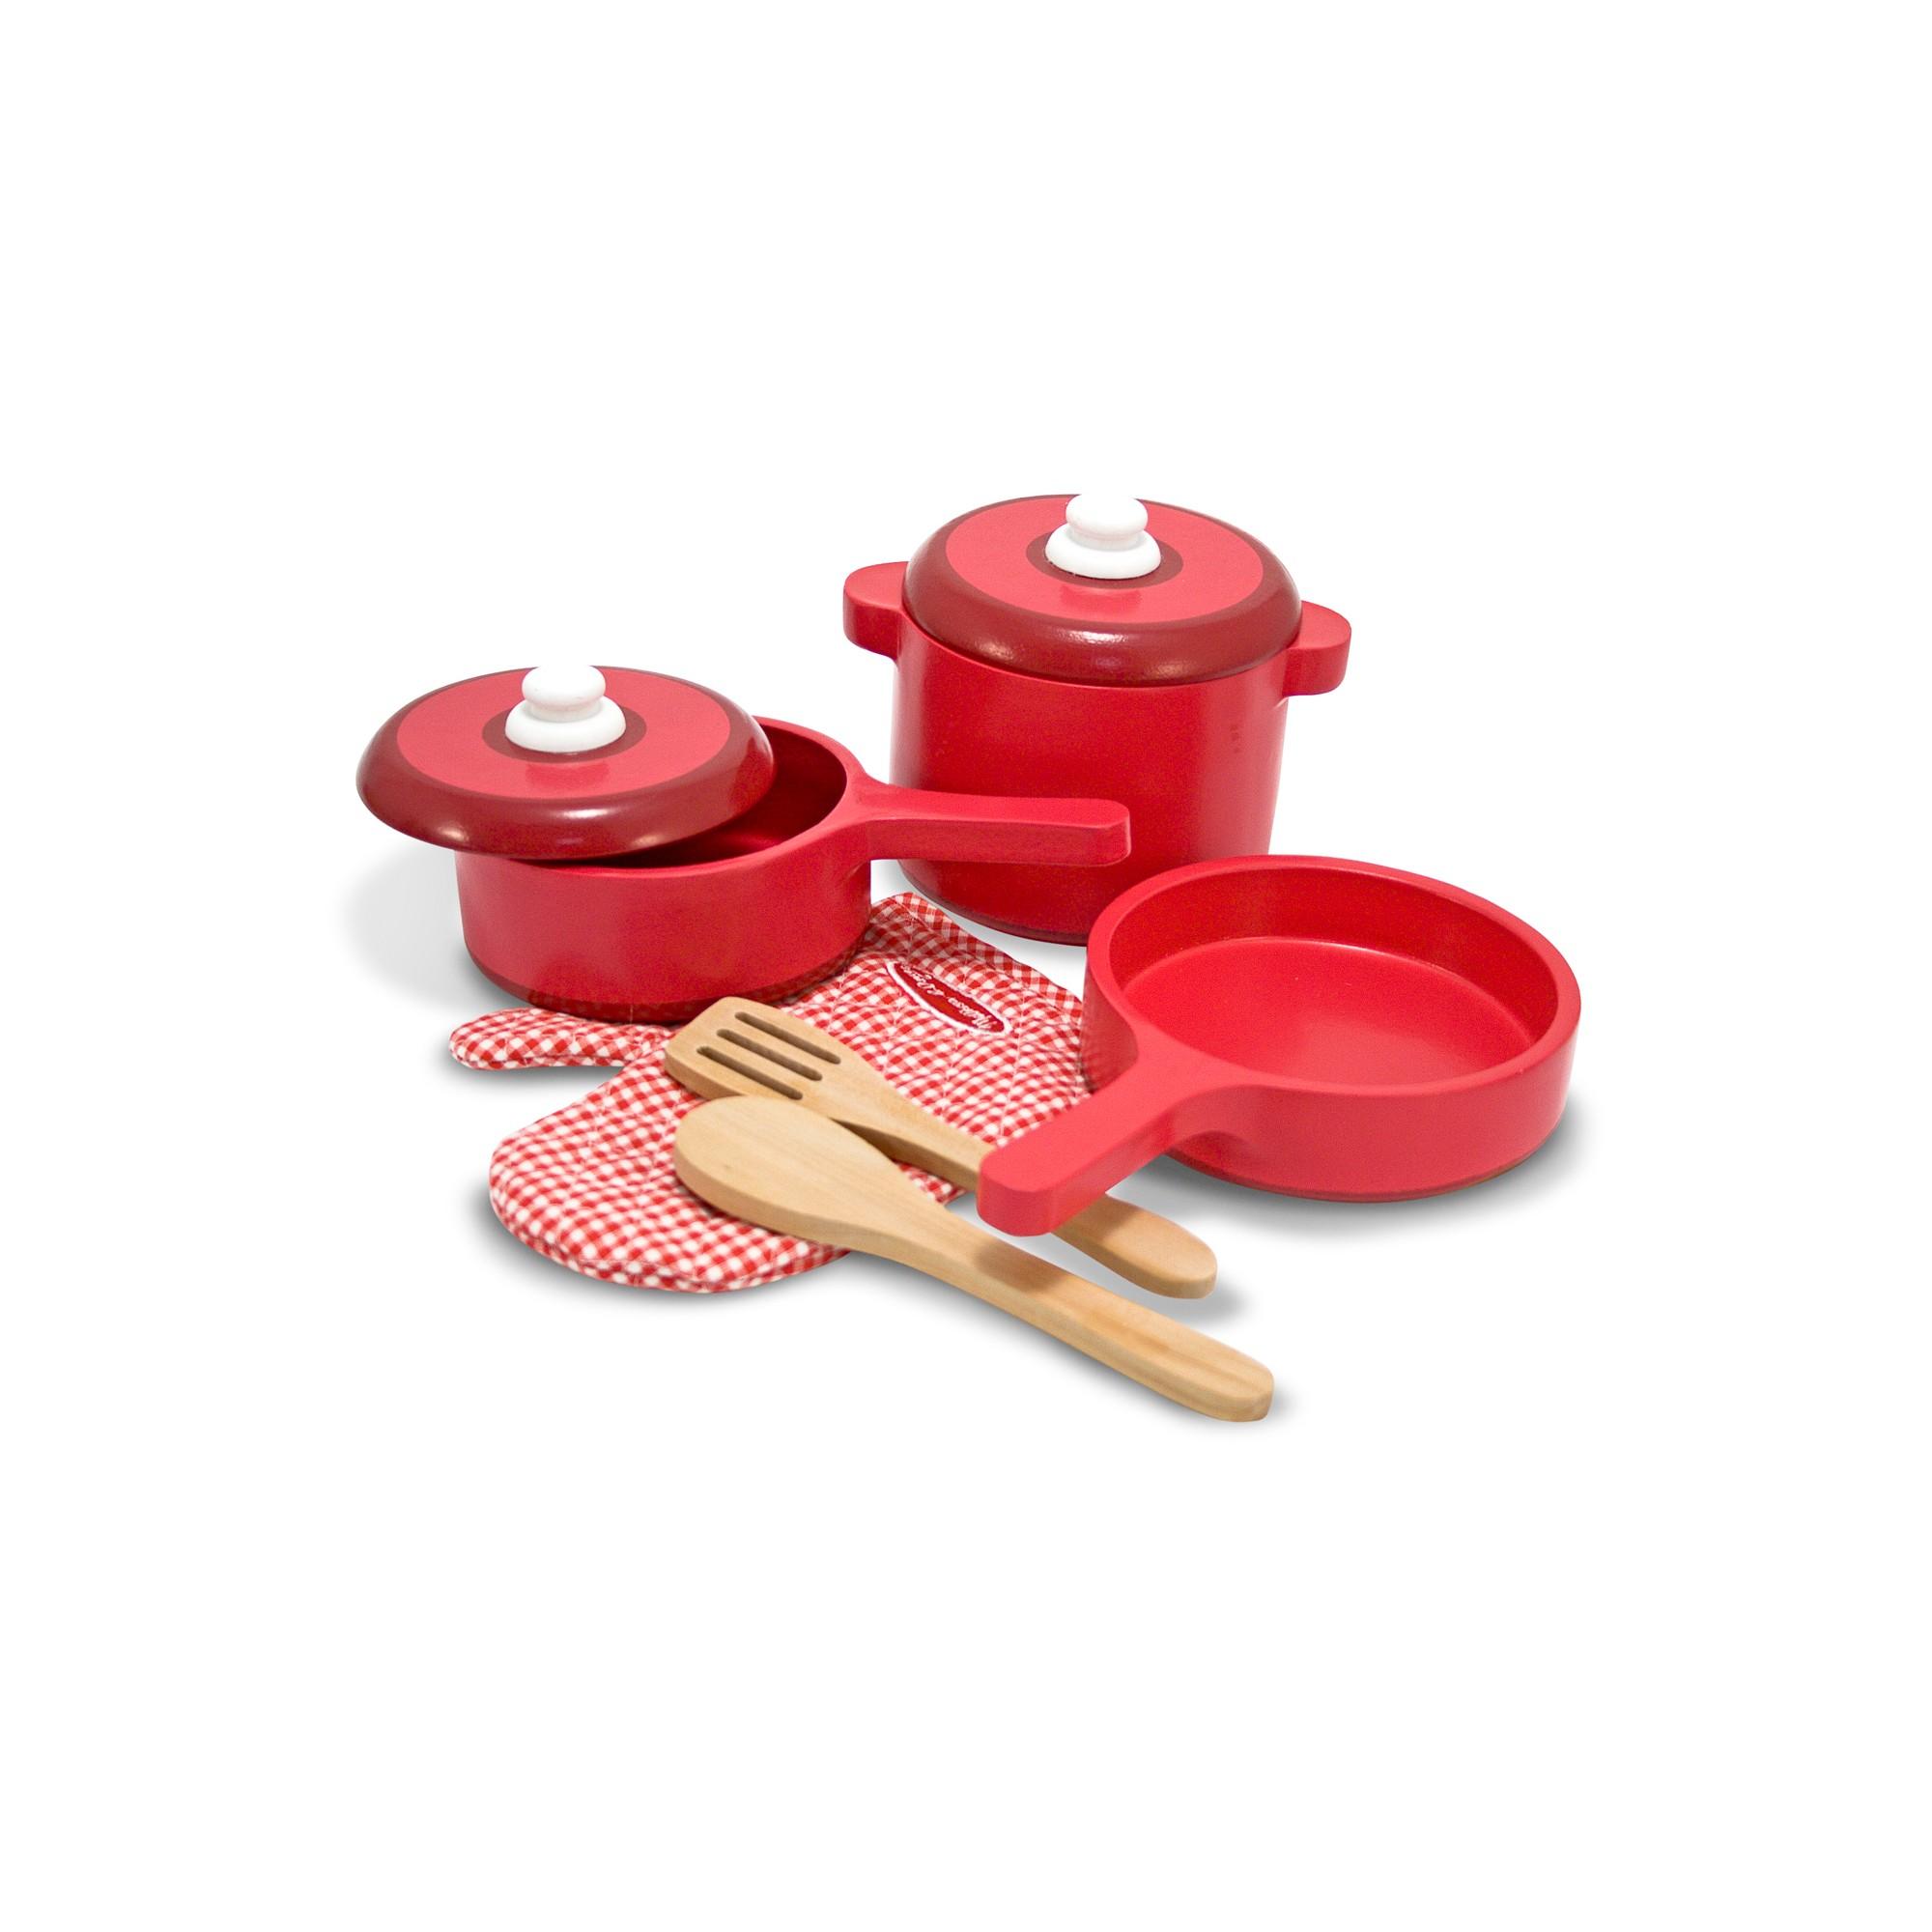 Remarkable Melissa Doug Deluxe Wooden Kitchen Accessory Set Pots Home Remodeling Inspirations Propsscottssportslandcom